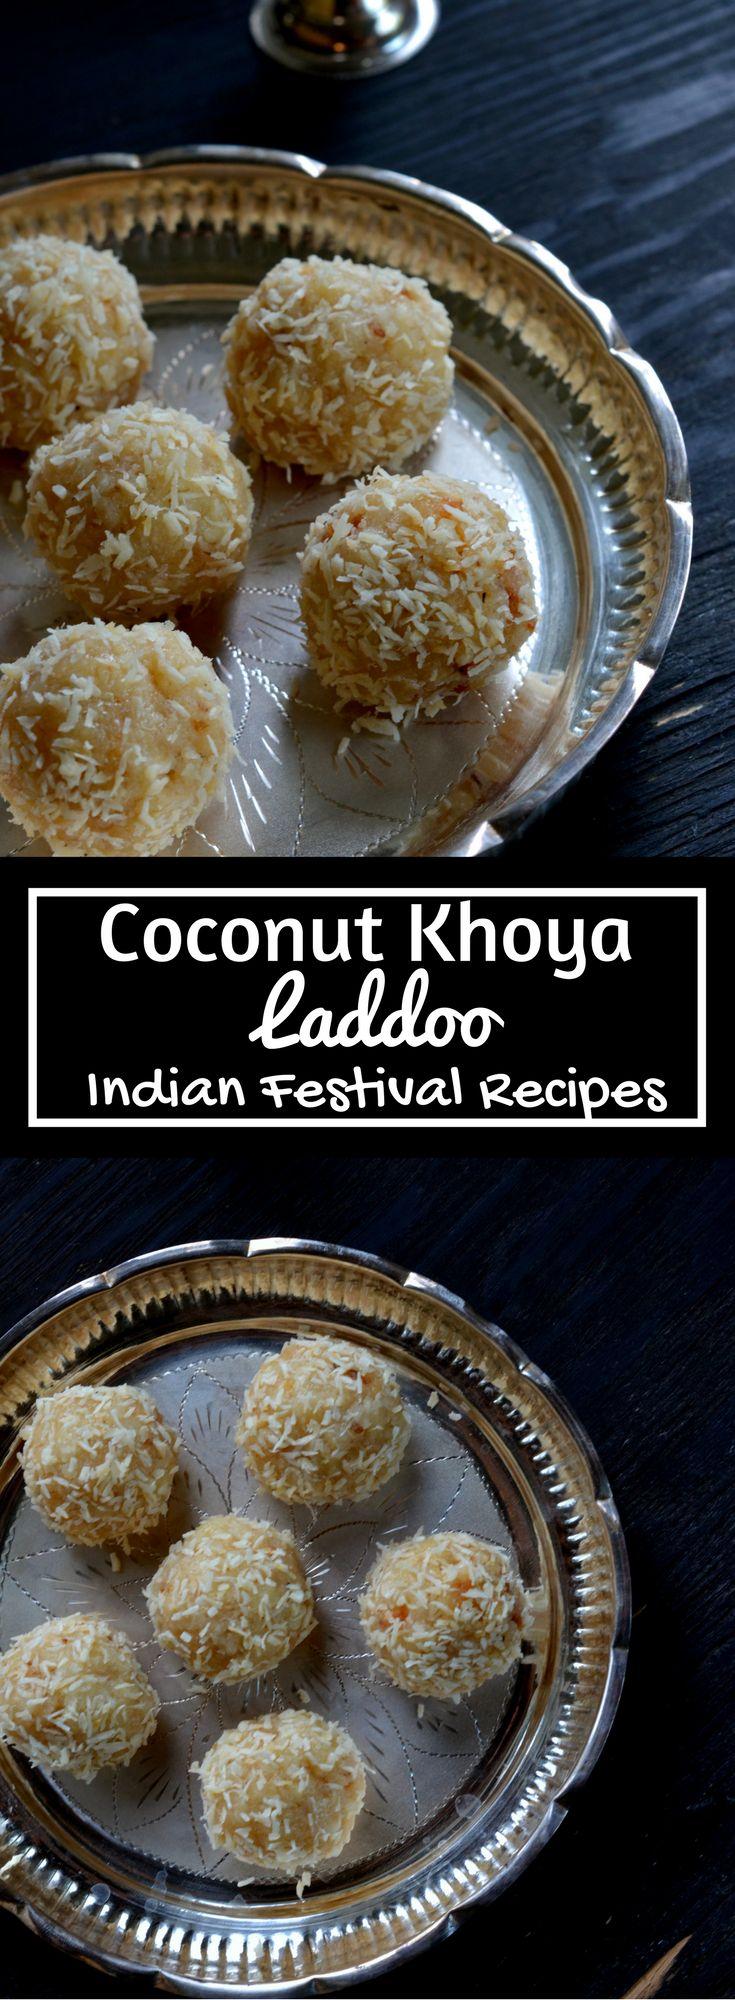 1958 best desi desserts images on pinterest indian recipes indian coconut khoya laddoo coconut condensed milk solids balls indian food recipe dessert forumfinder Gallery